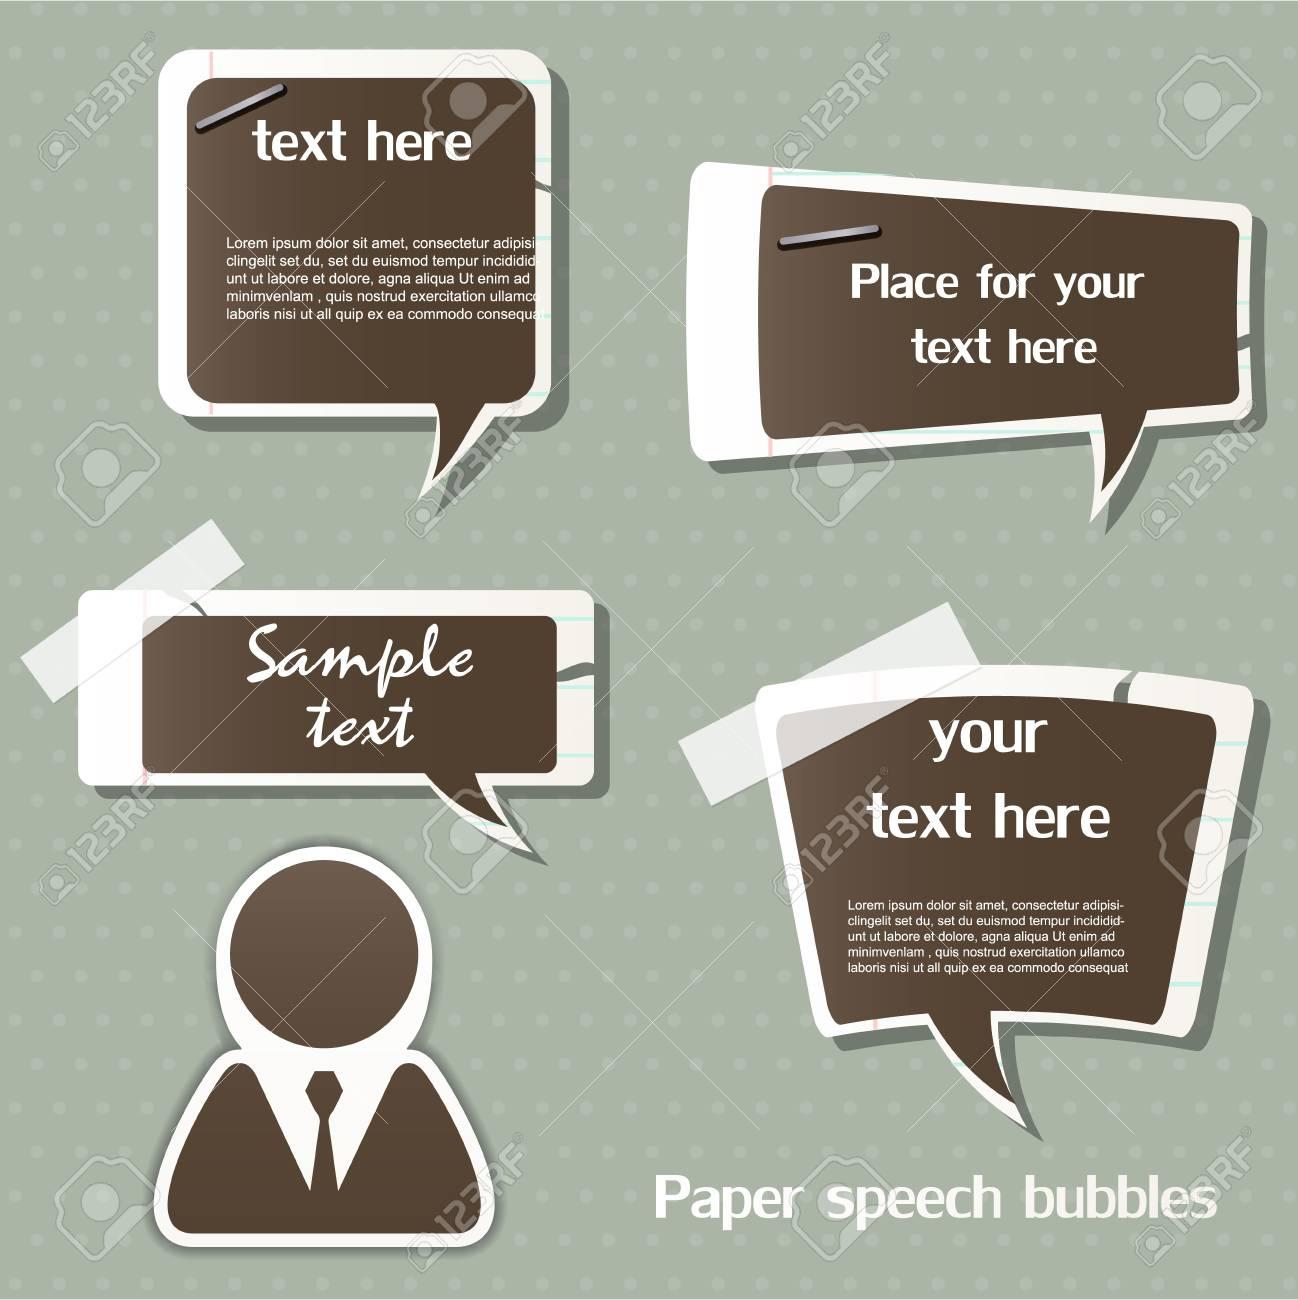 Paper speech bubbles Stock Vector - 12795892